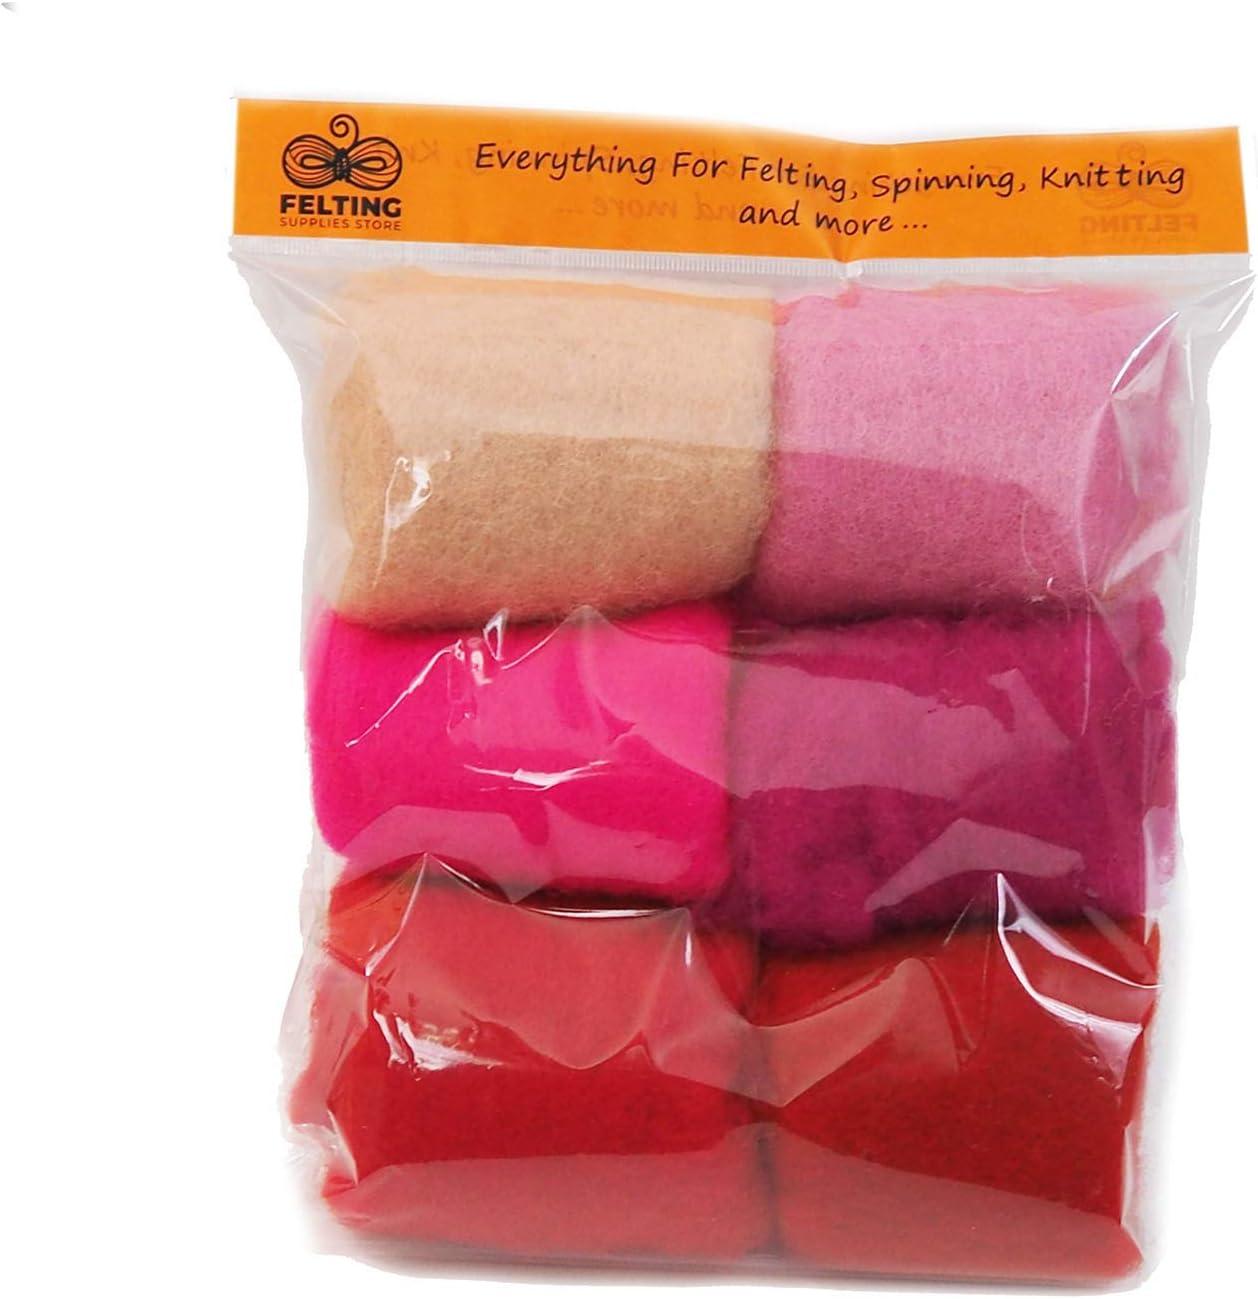 Pink Palette Wool Felt Pack Wool Batt Spinning Carded Wool Set for Needle Felting Starter Kit Felting Supplies 26-29micron Felting Wool Kit Wet and Nuno Felting 60g//2.1oz